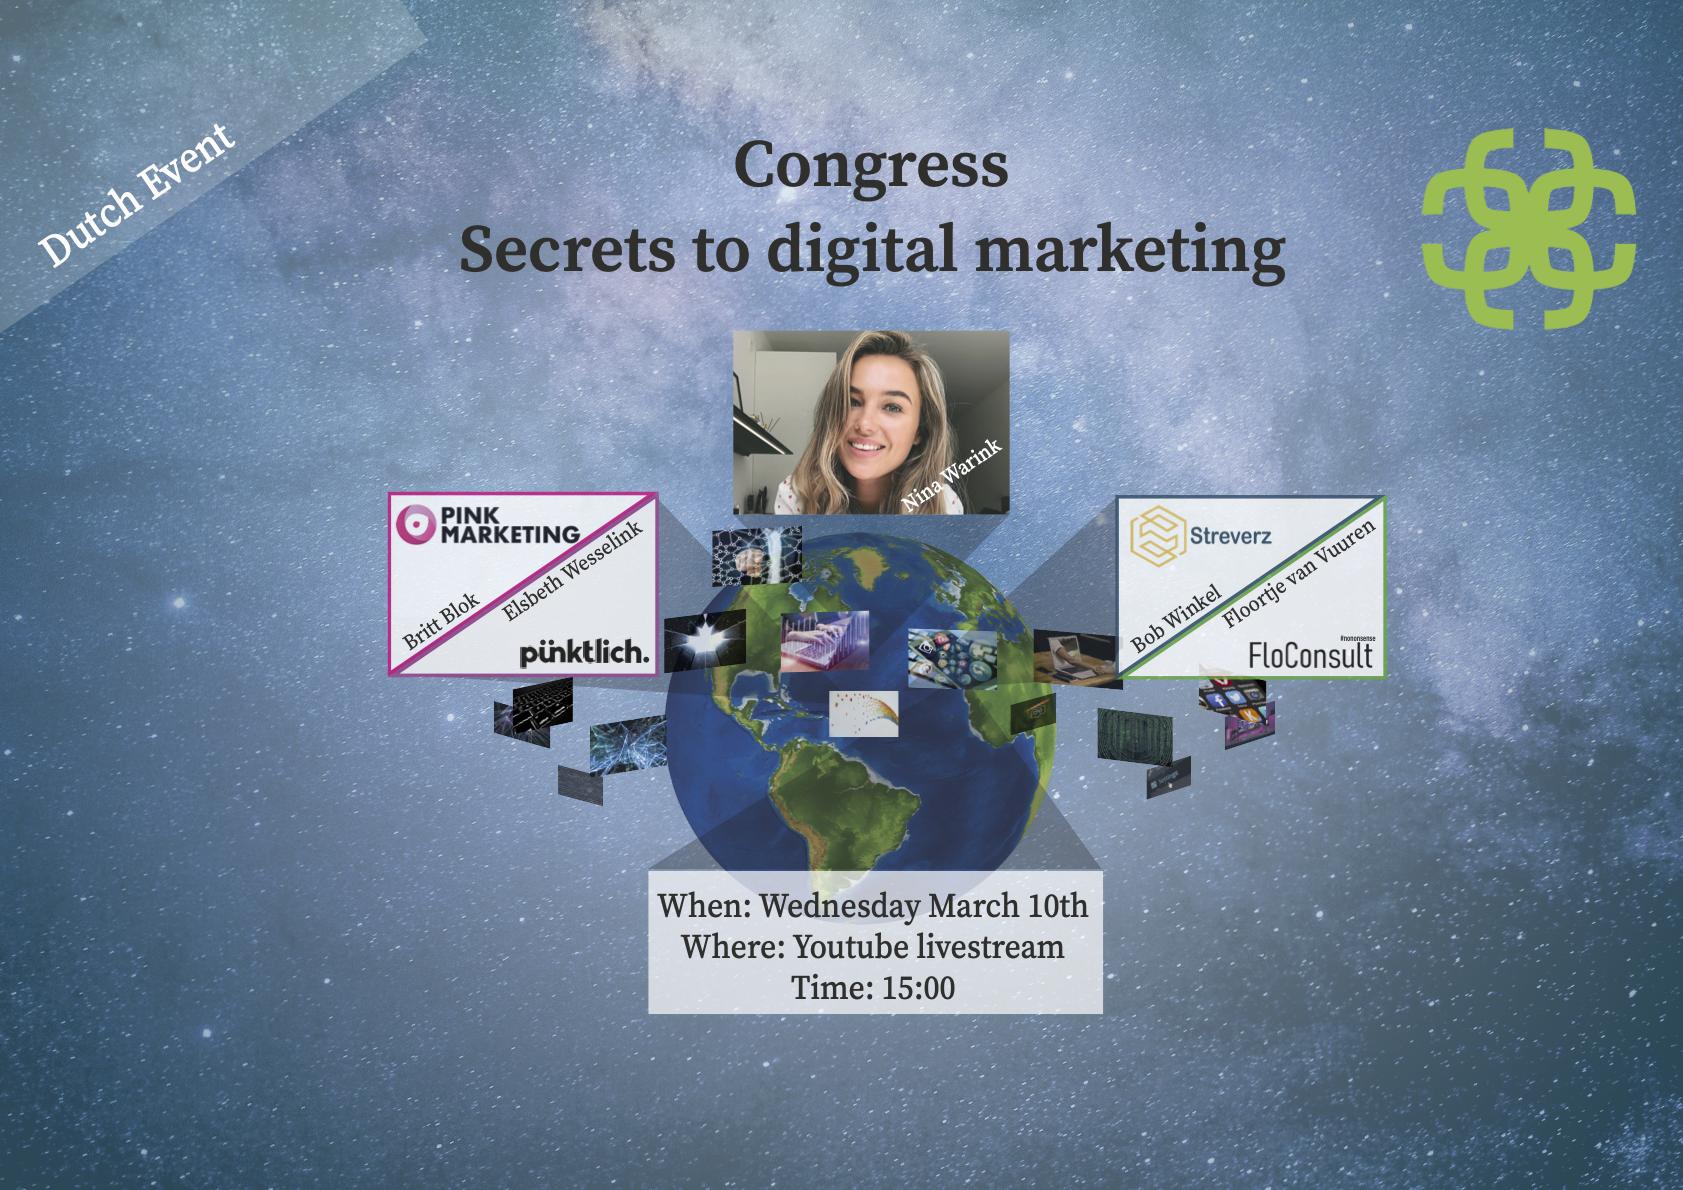 Congres: Secrets to digital marketing